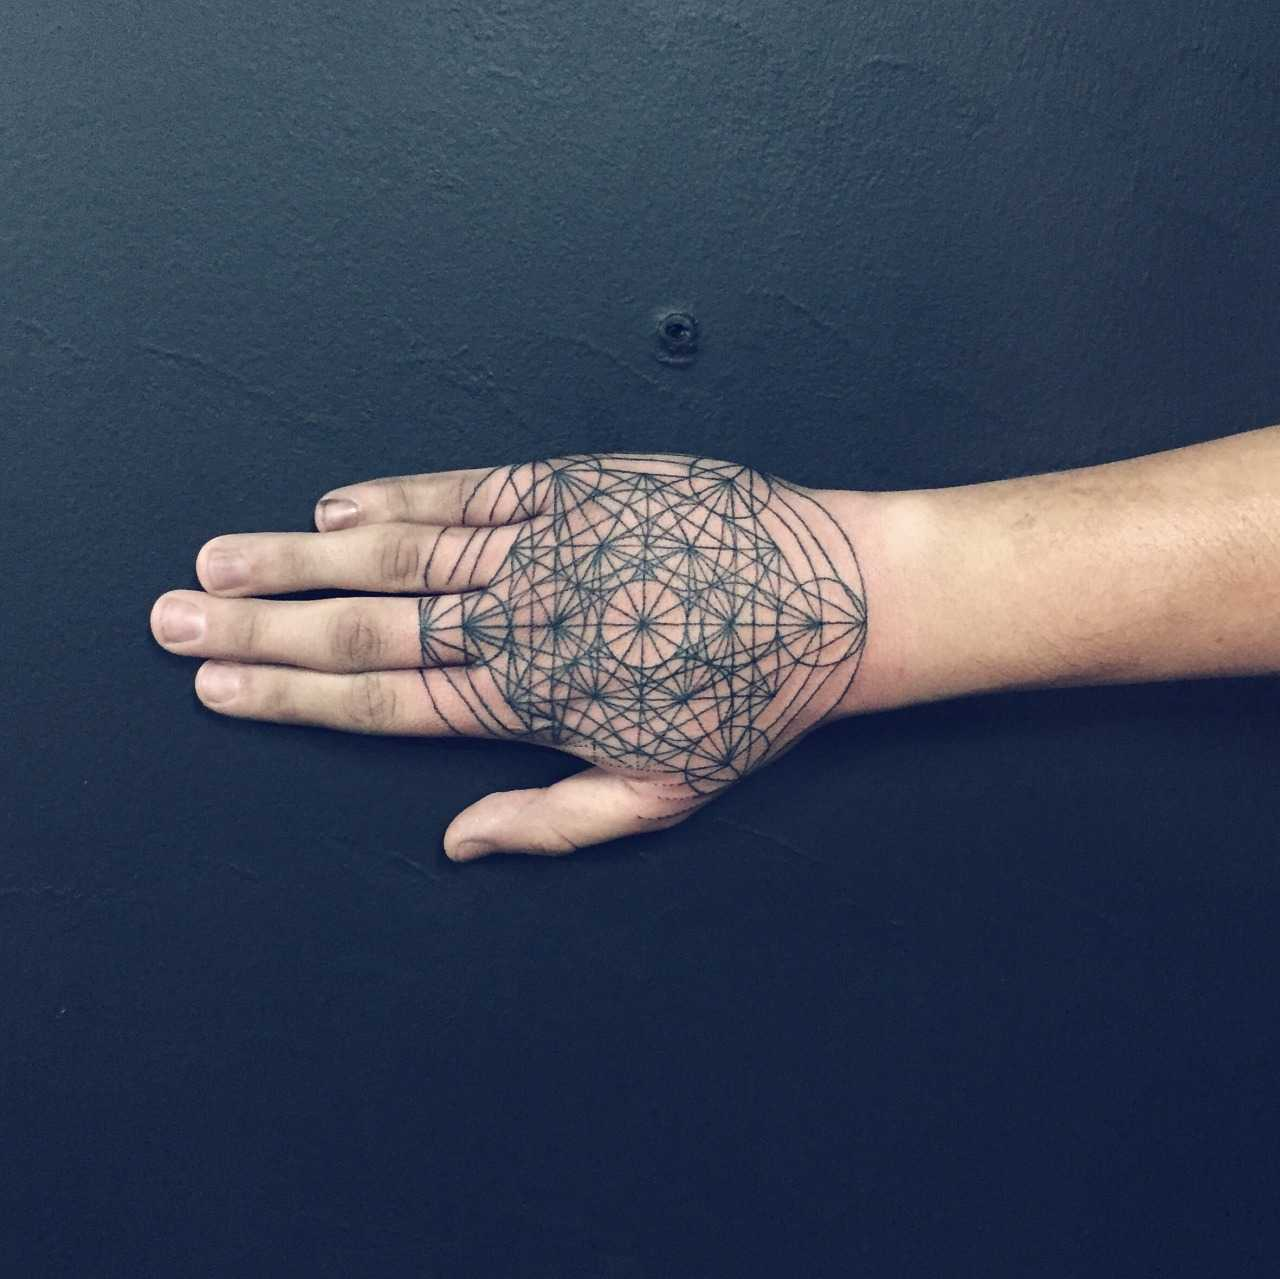 Metatrons cube tattoo by Shanna Keyes